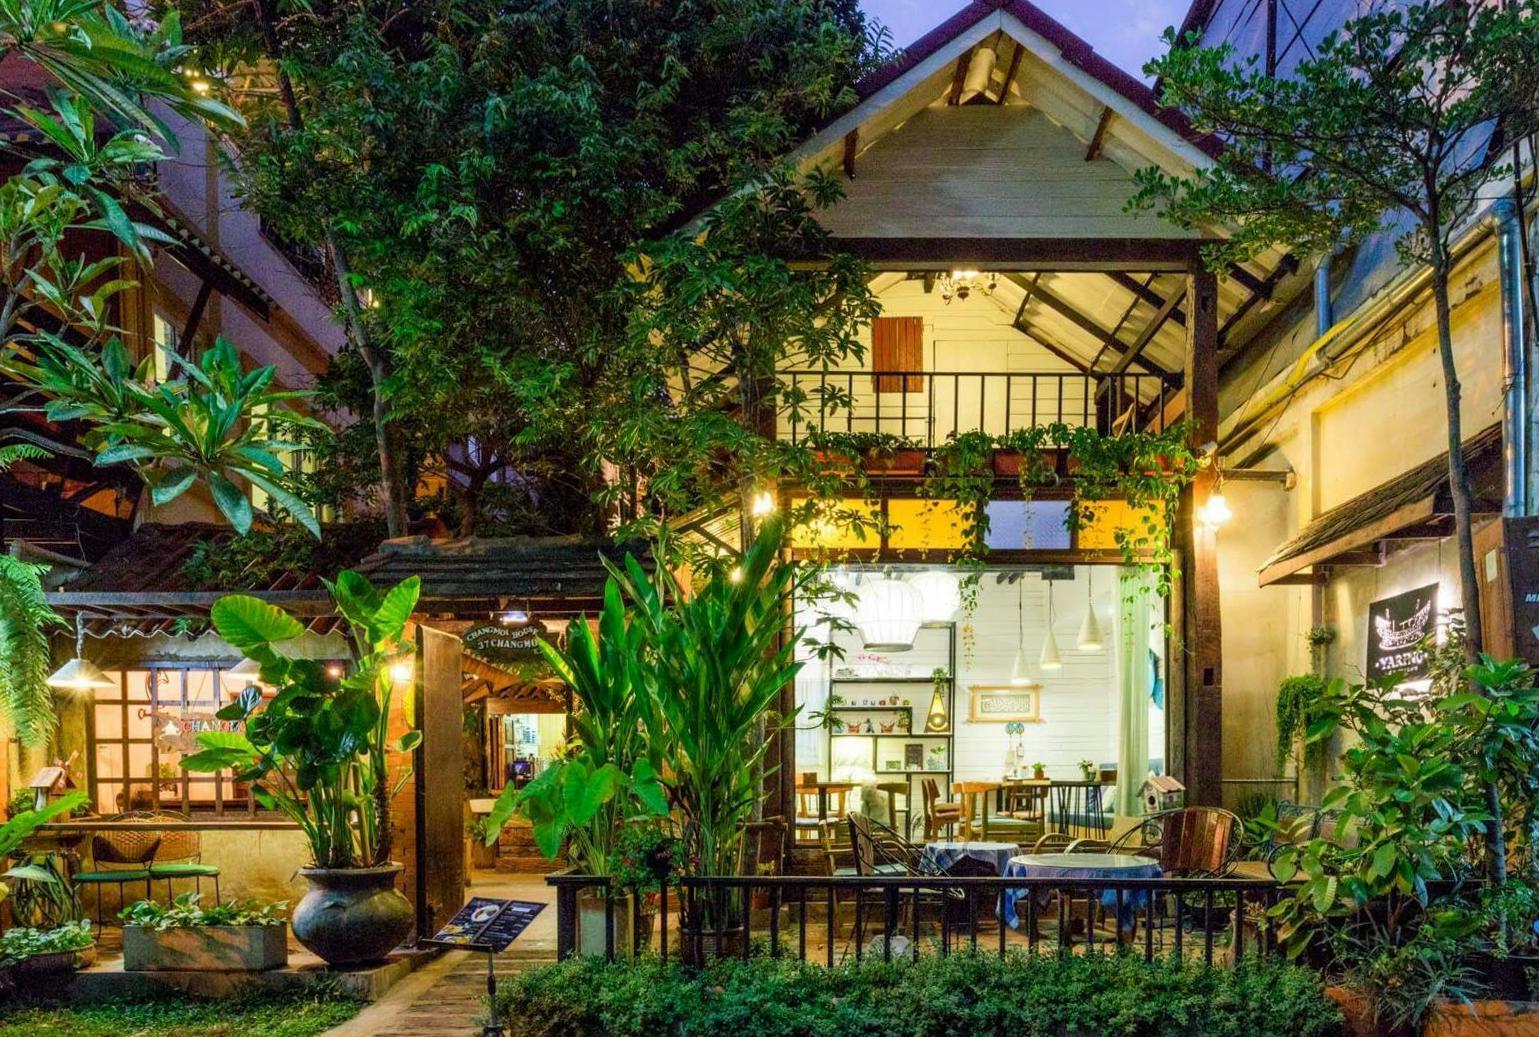 Pantip รีวิว ช้างม่อย เฮาส์ ลิตเติล วิลเลจ (Changmoi House Little Village) ลดกระหน่ำ